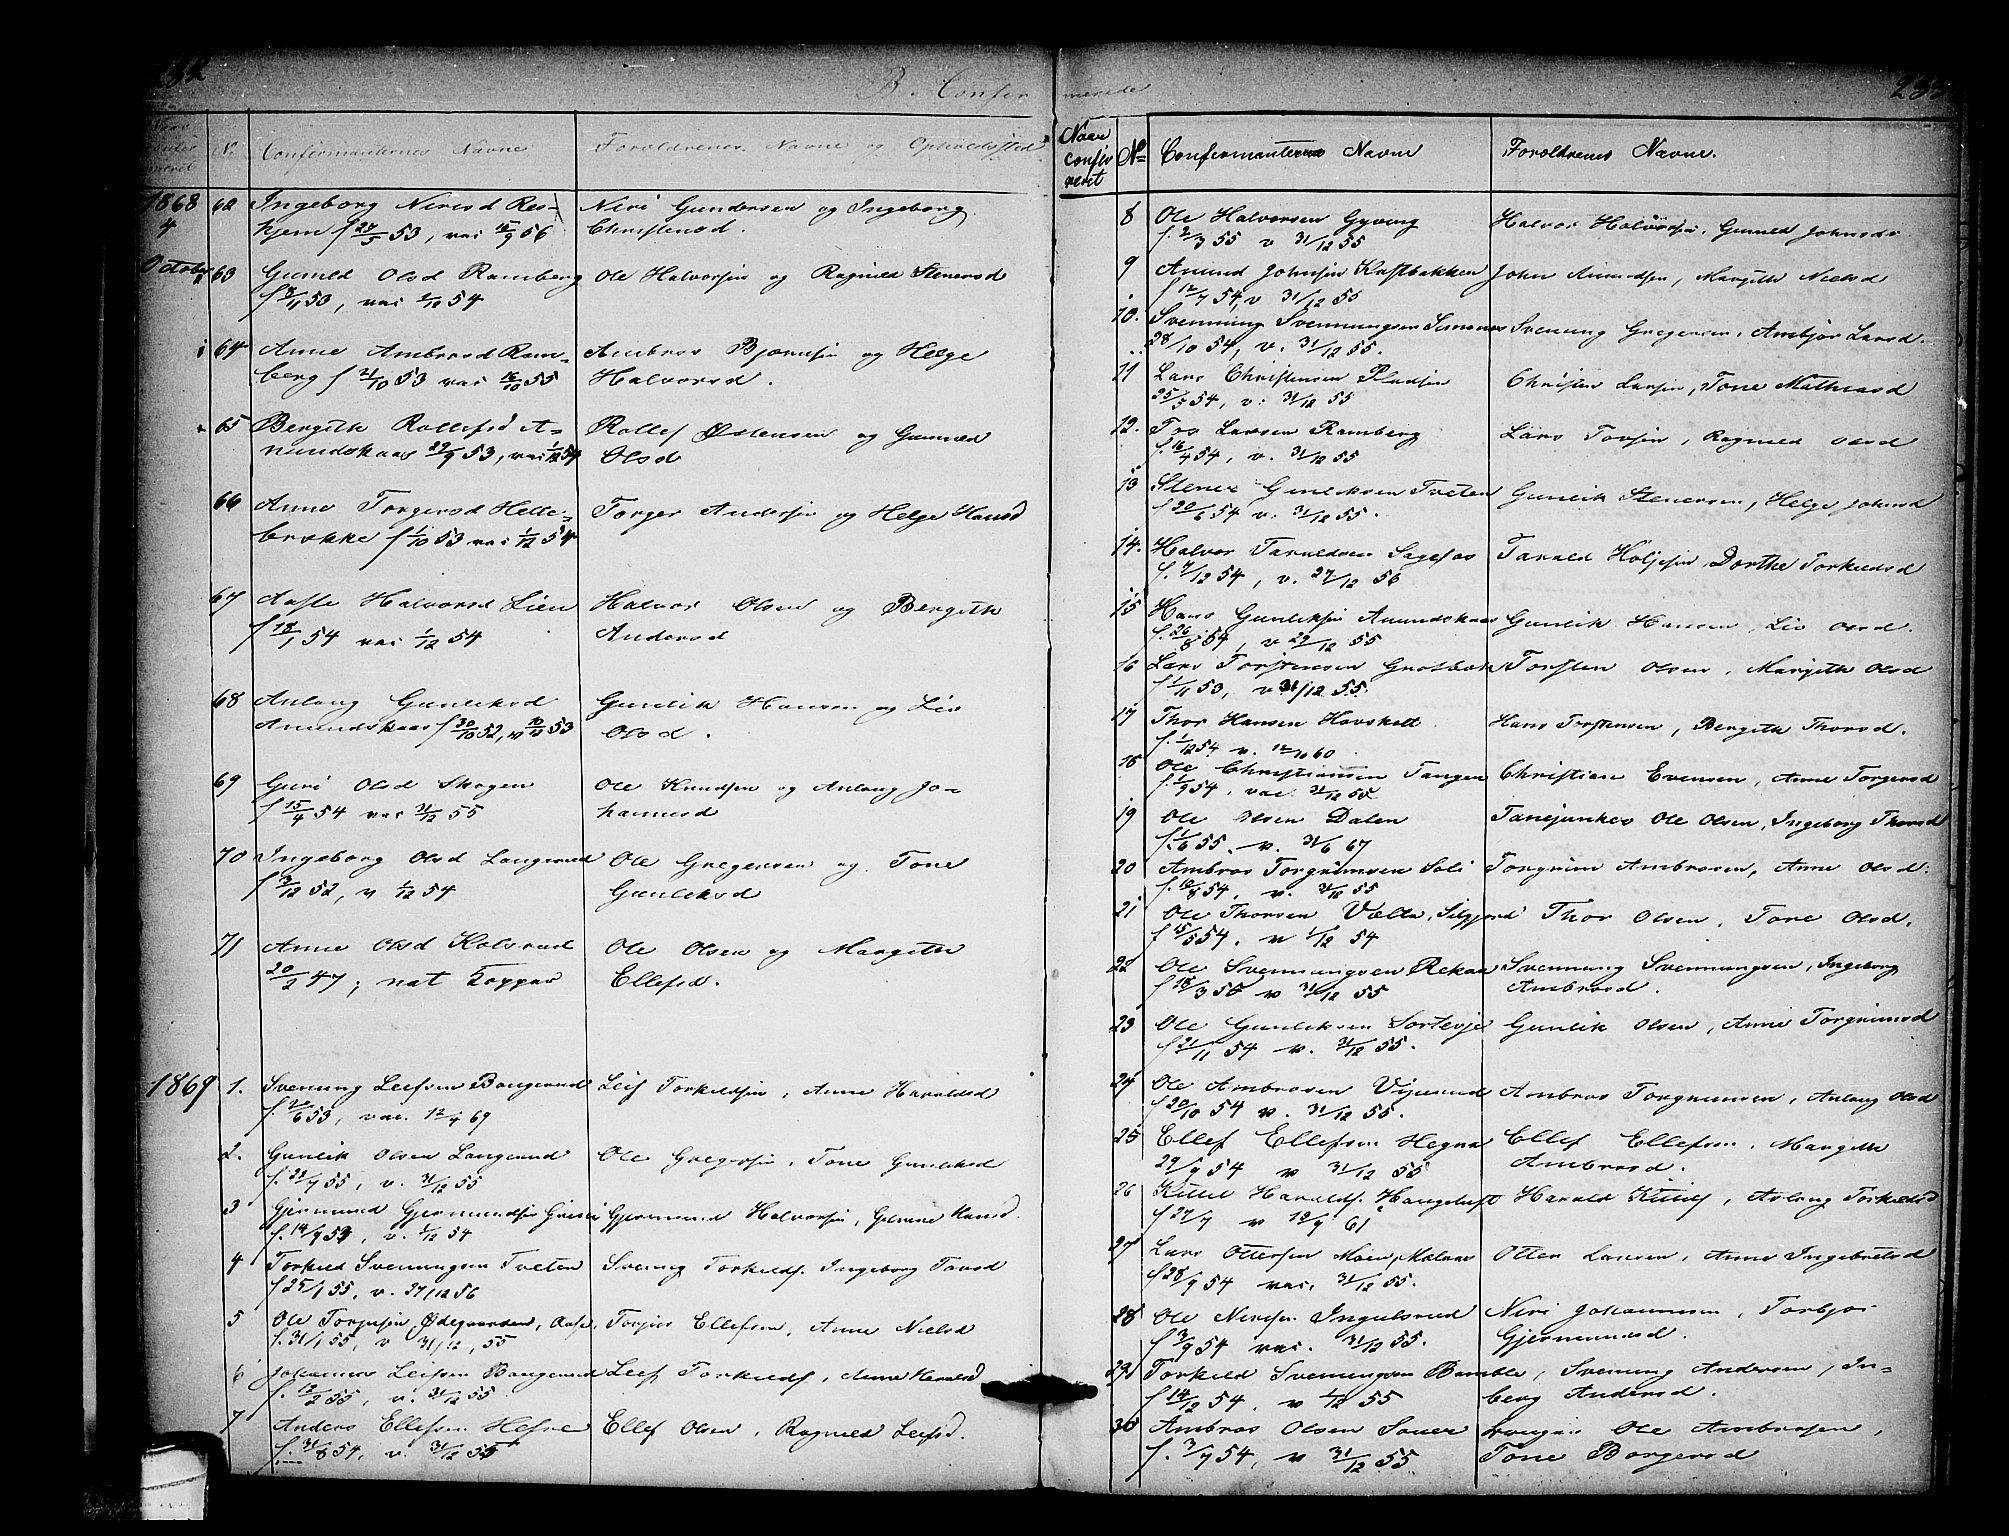 SAKO, Heddal kirkebøker, G/Ga/L0001: Klokkerbok nr. I 1, 1866-1878, s. 232-233